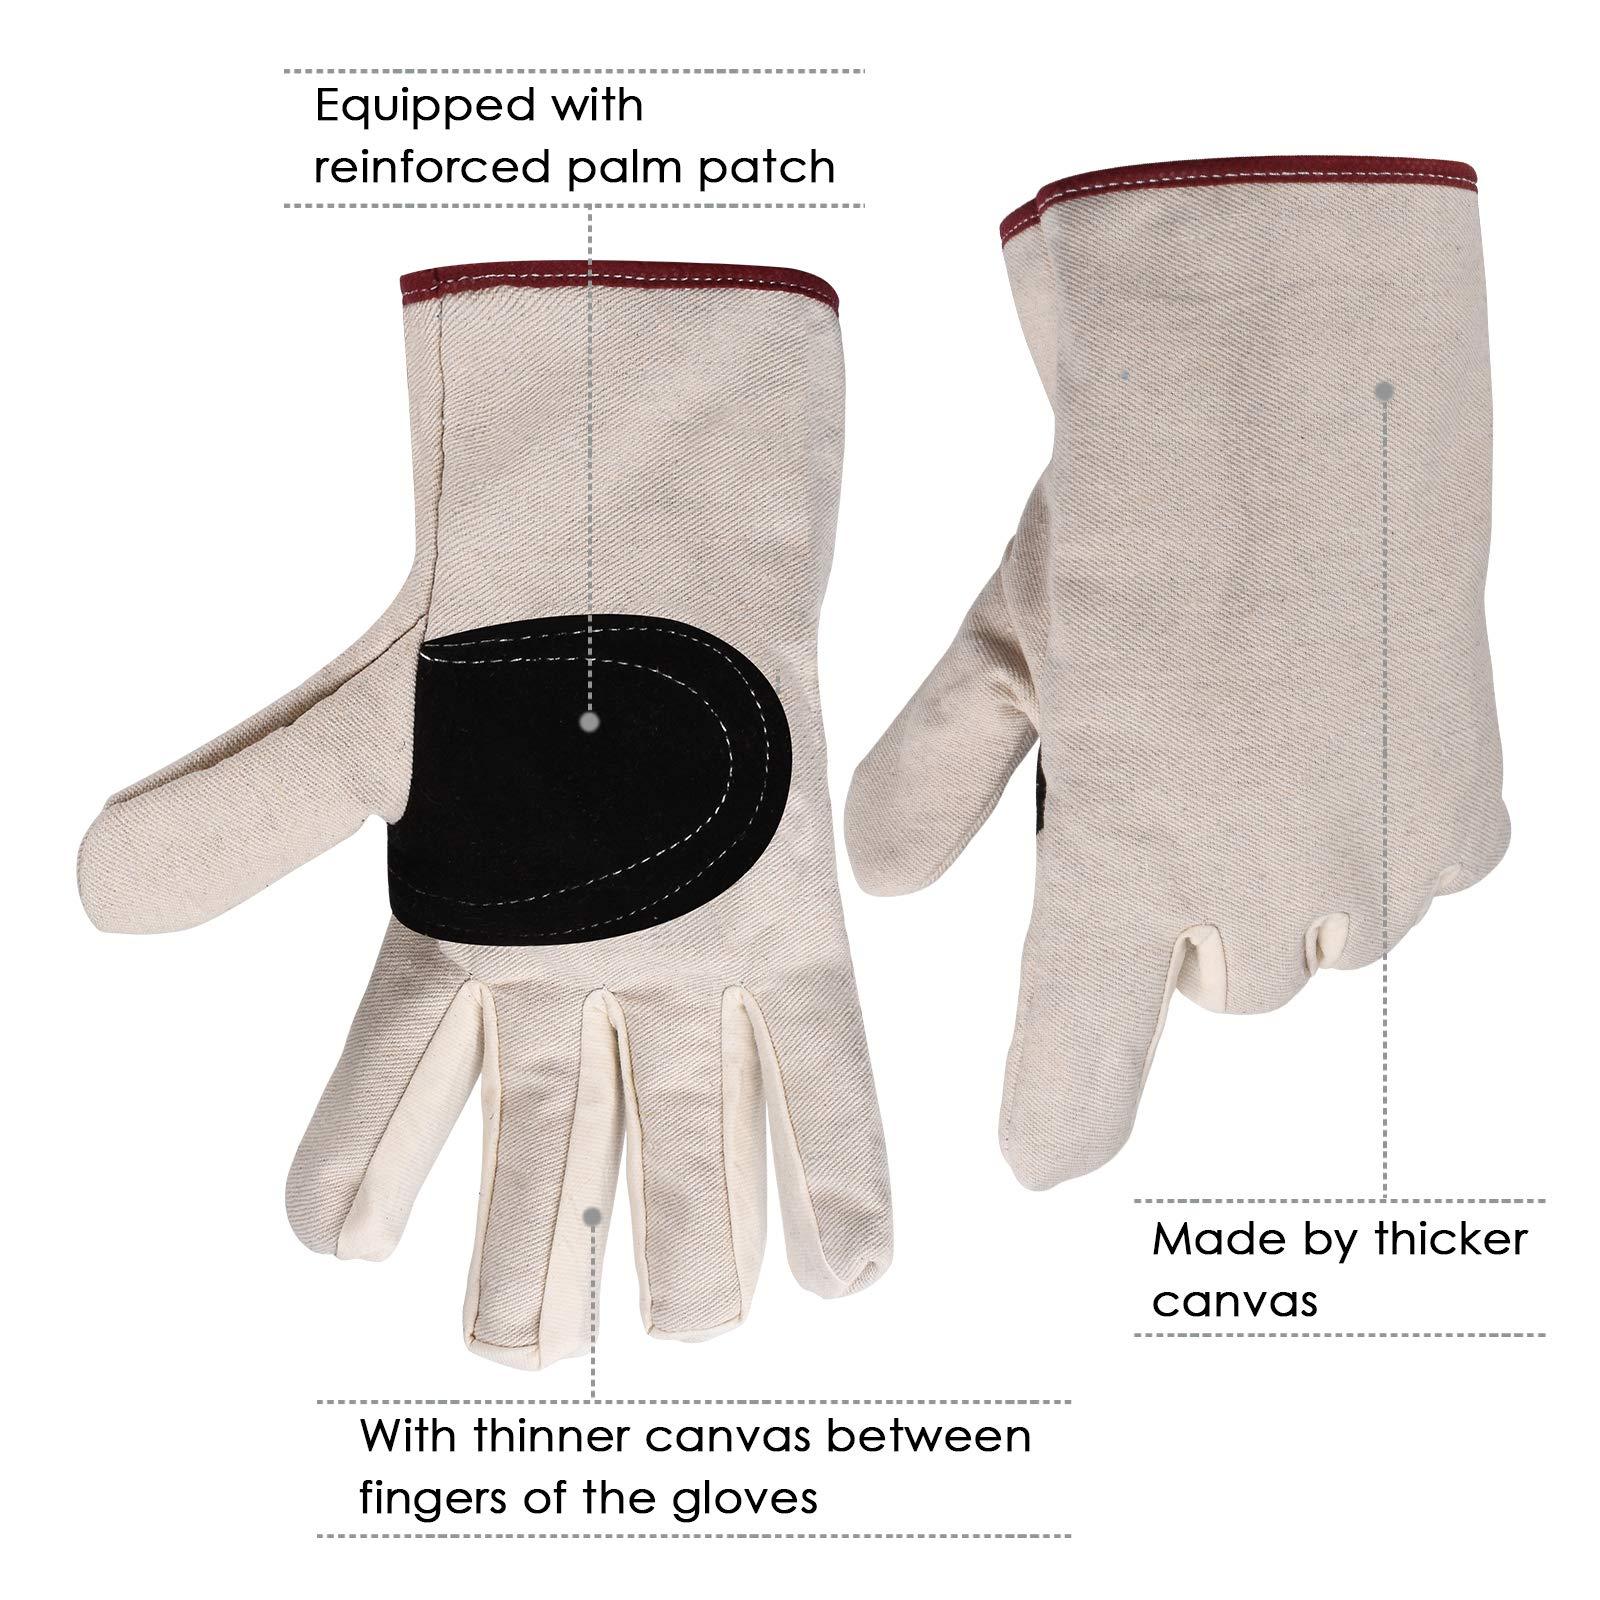 KORAM Bypass Pruning Shears Heavy Duty Hand Pruner with Garden Gloves - Ergonomic Handles Stainless, Steel Blades Garden Shears for Branch, Hedge, Shrub & Bush